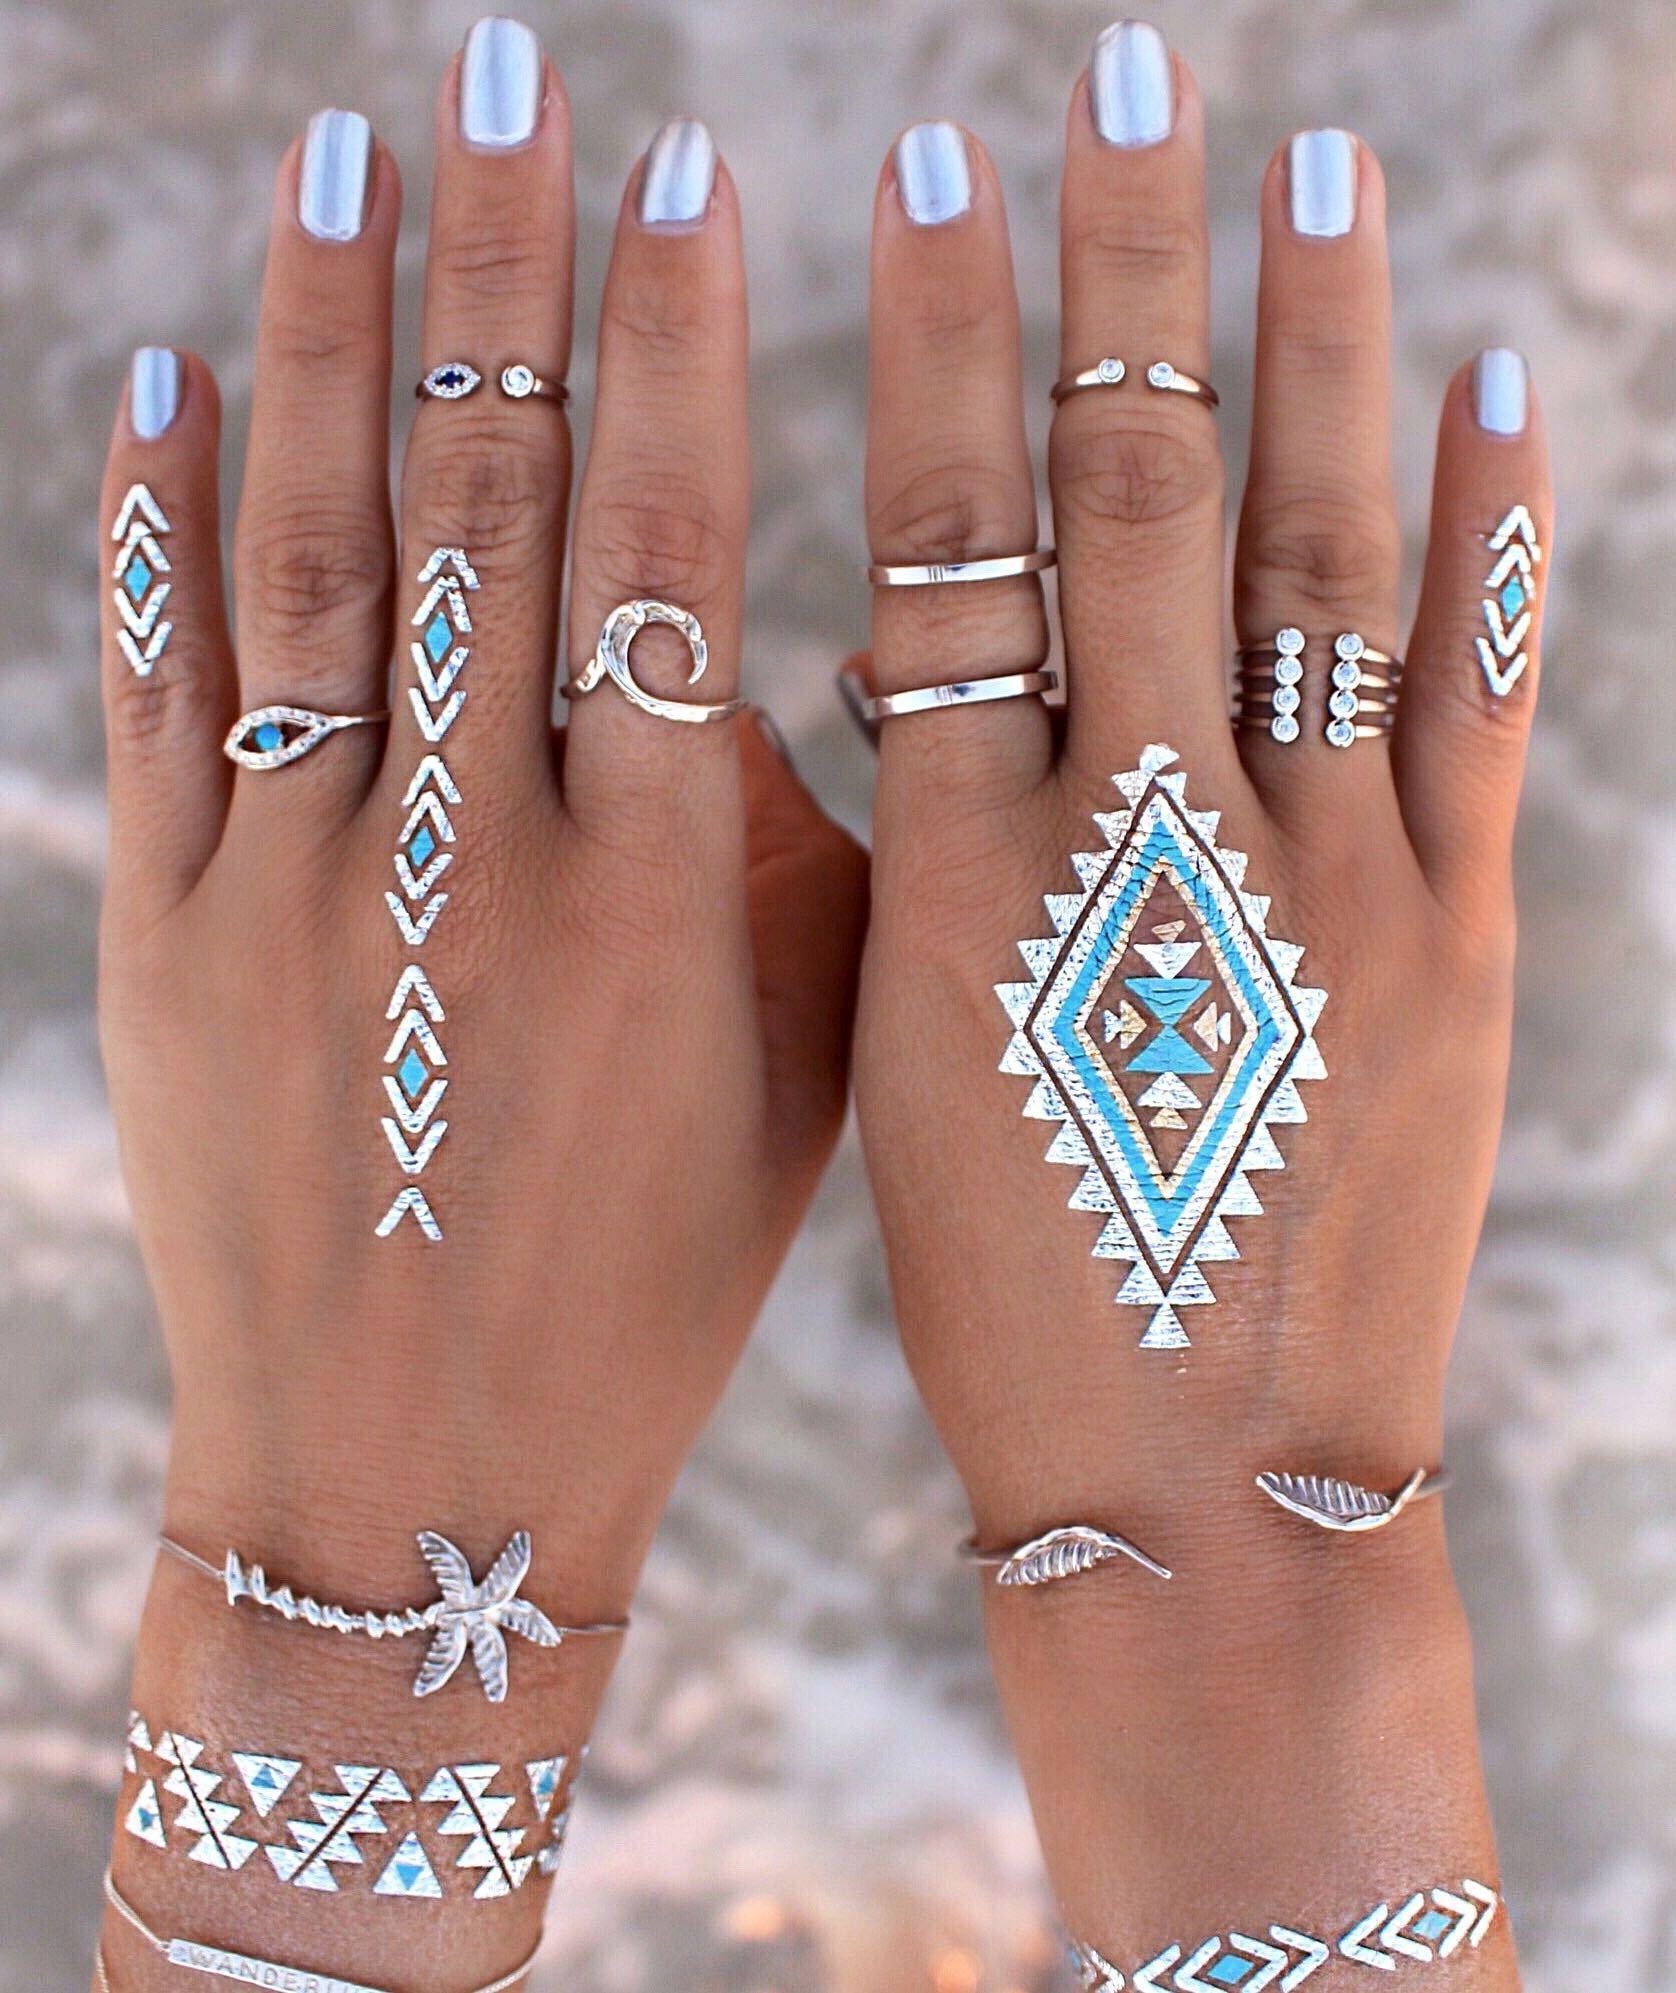 Flash Tatto And Silver Jewelry Beach Style #Fashionistas | Bikinis ...